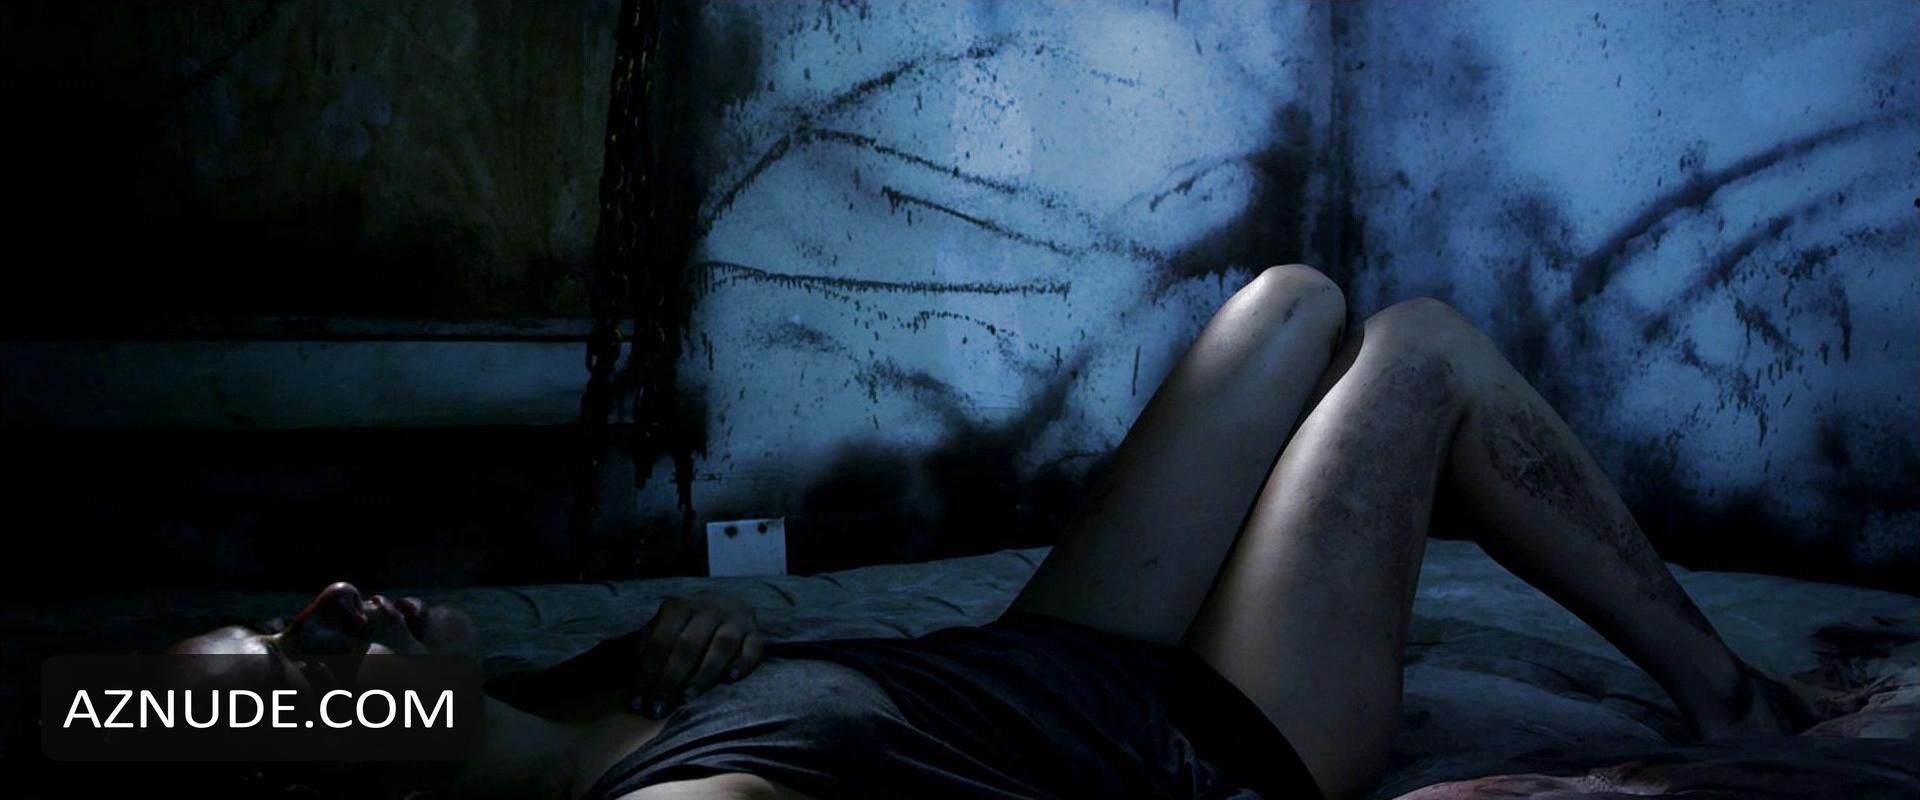 Head mistress goes rogue - 1 3